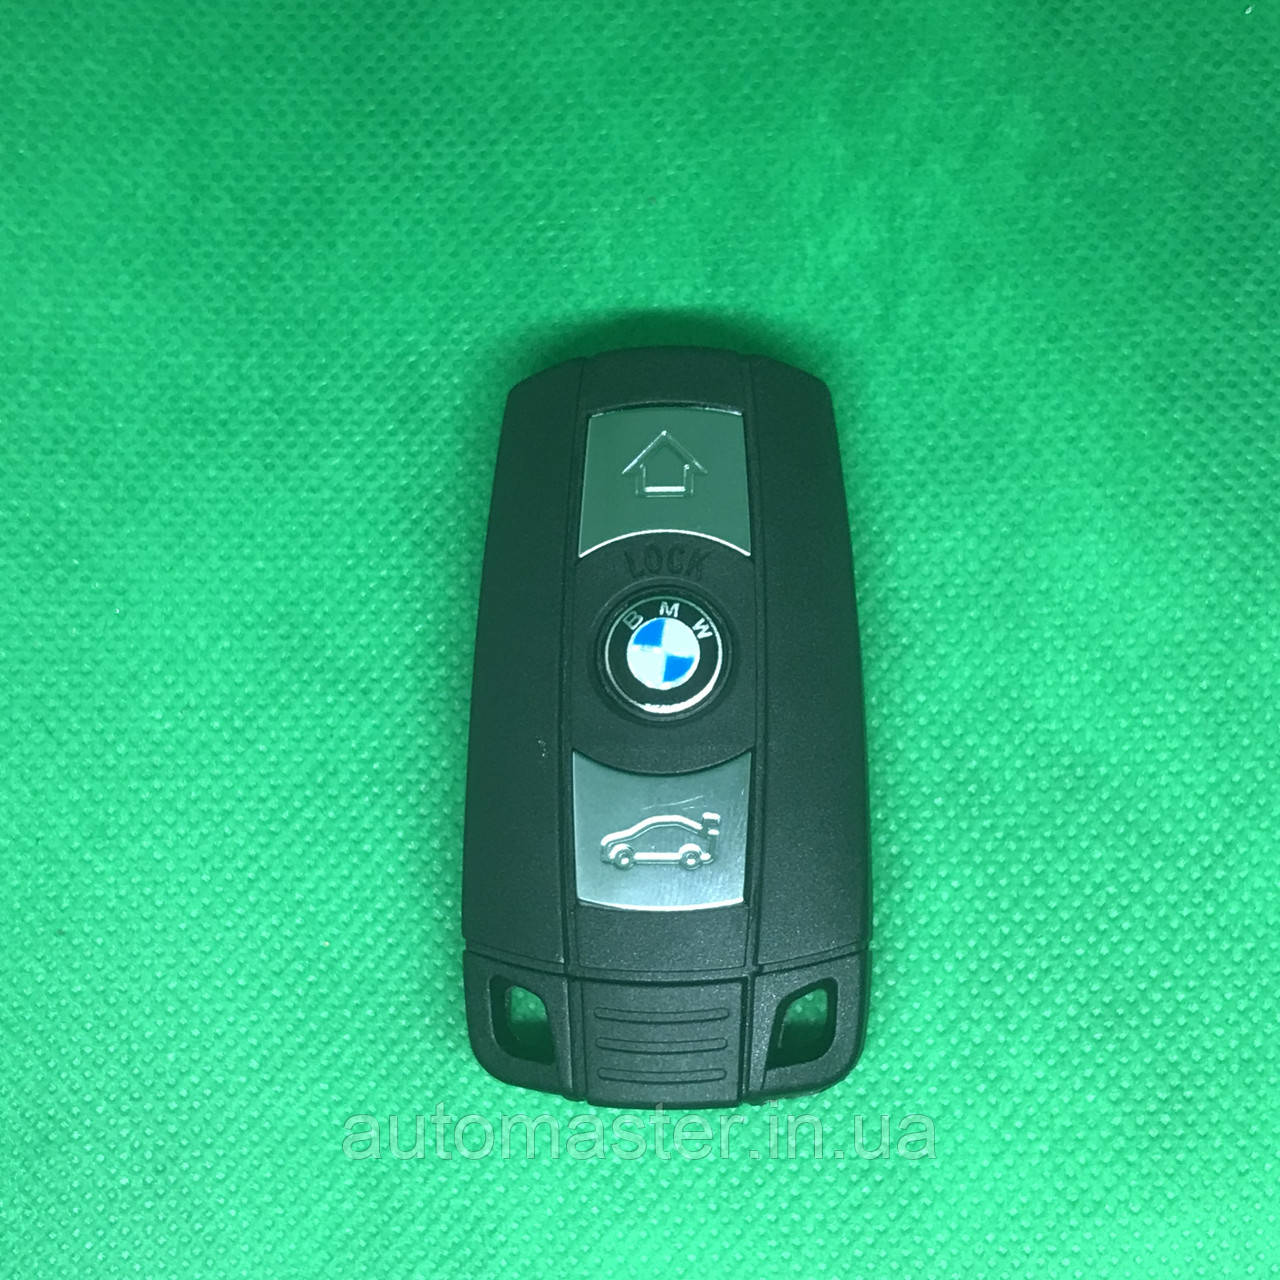 Смарт ключ BMW (БМВ) 3 кнопки, keyless go (CAS3, CAS3+), 315 MHz, ID 46 Лезвие HU92 BMW 6986583-05